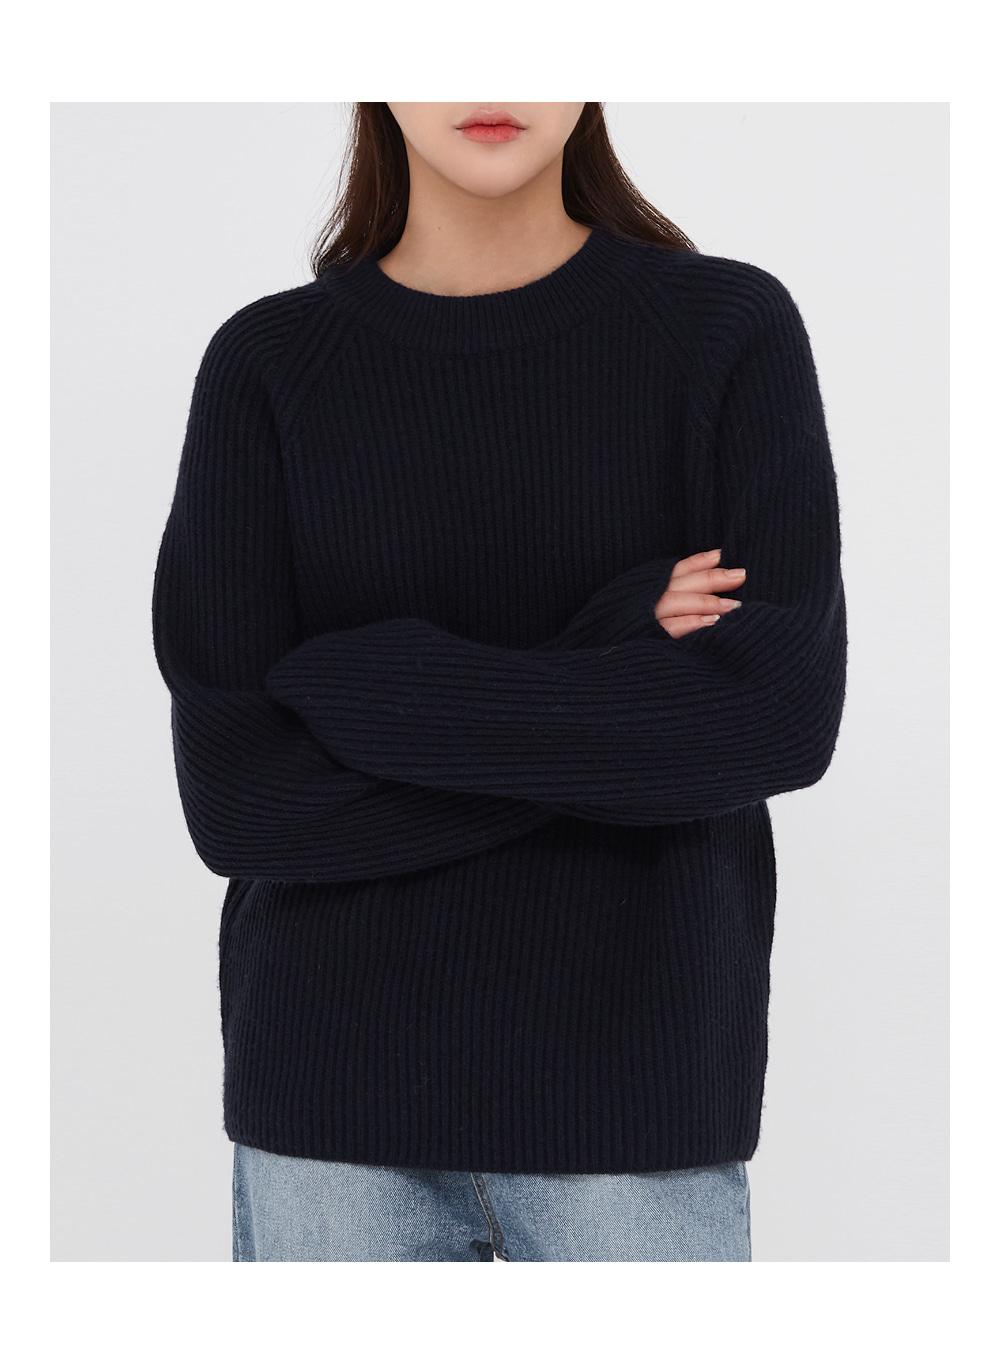 the golgi round wool knit